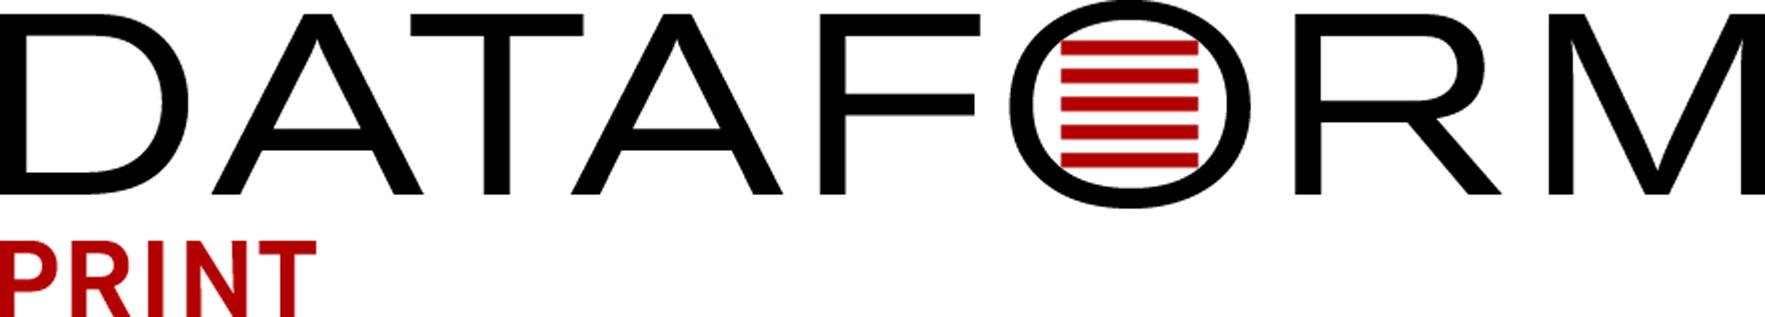 logo-12004